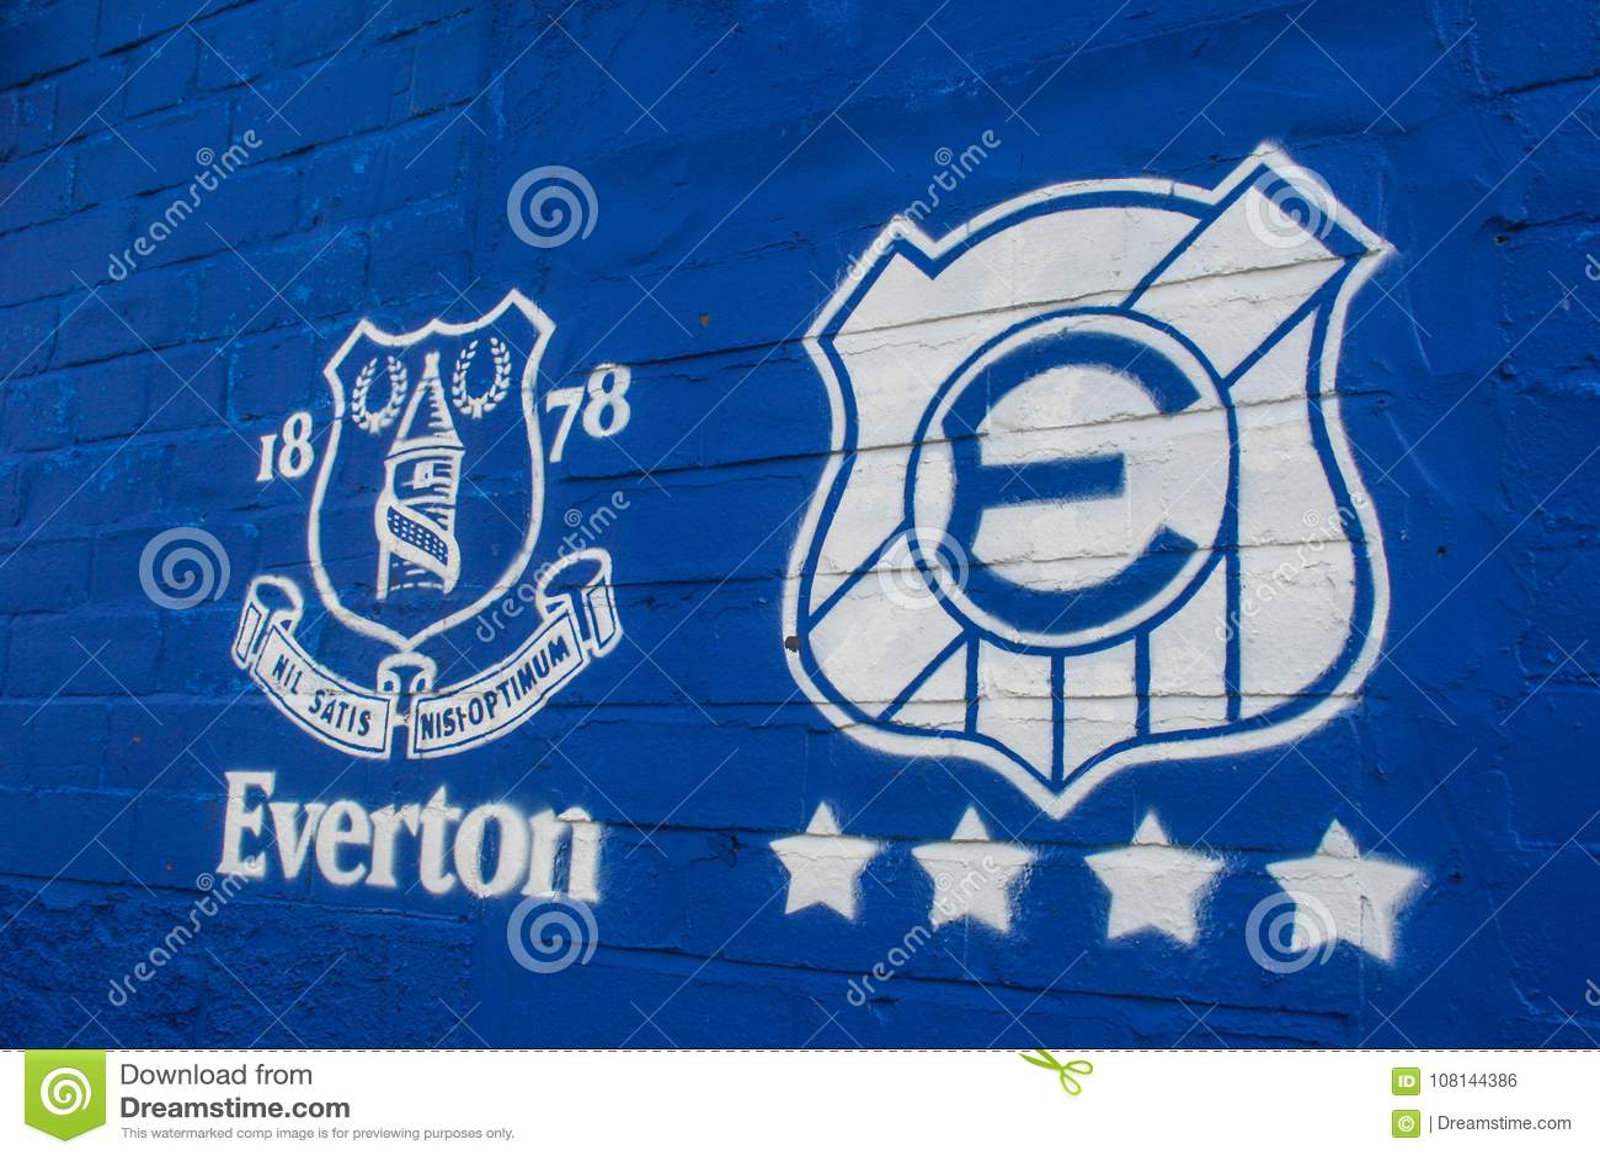 Everton Logo At The Goodison Park Stadium Editorial Photo Image Of Liverpool April 108144386